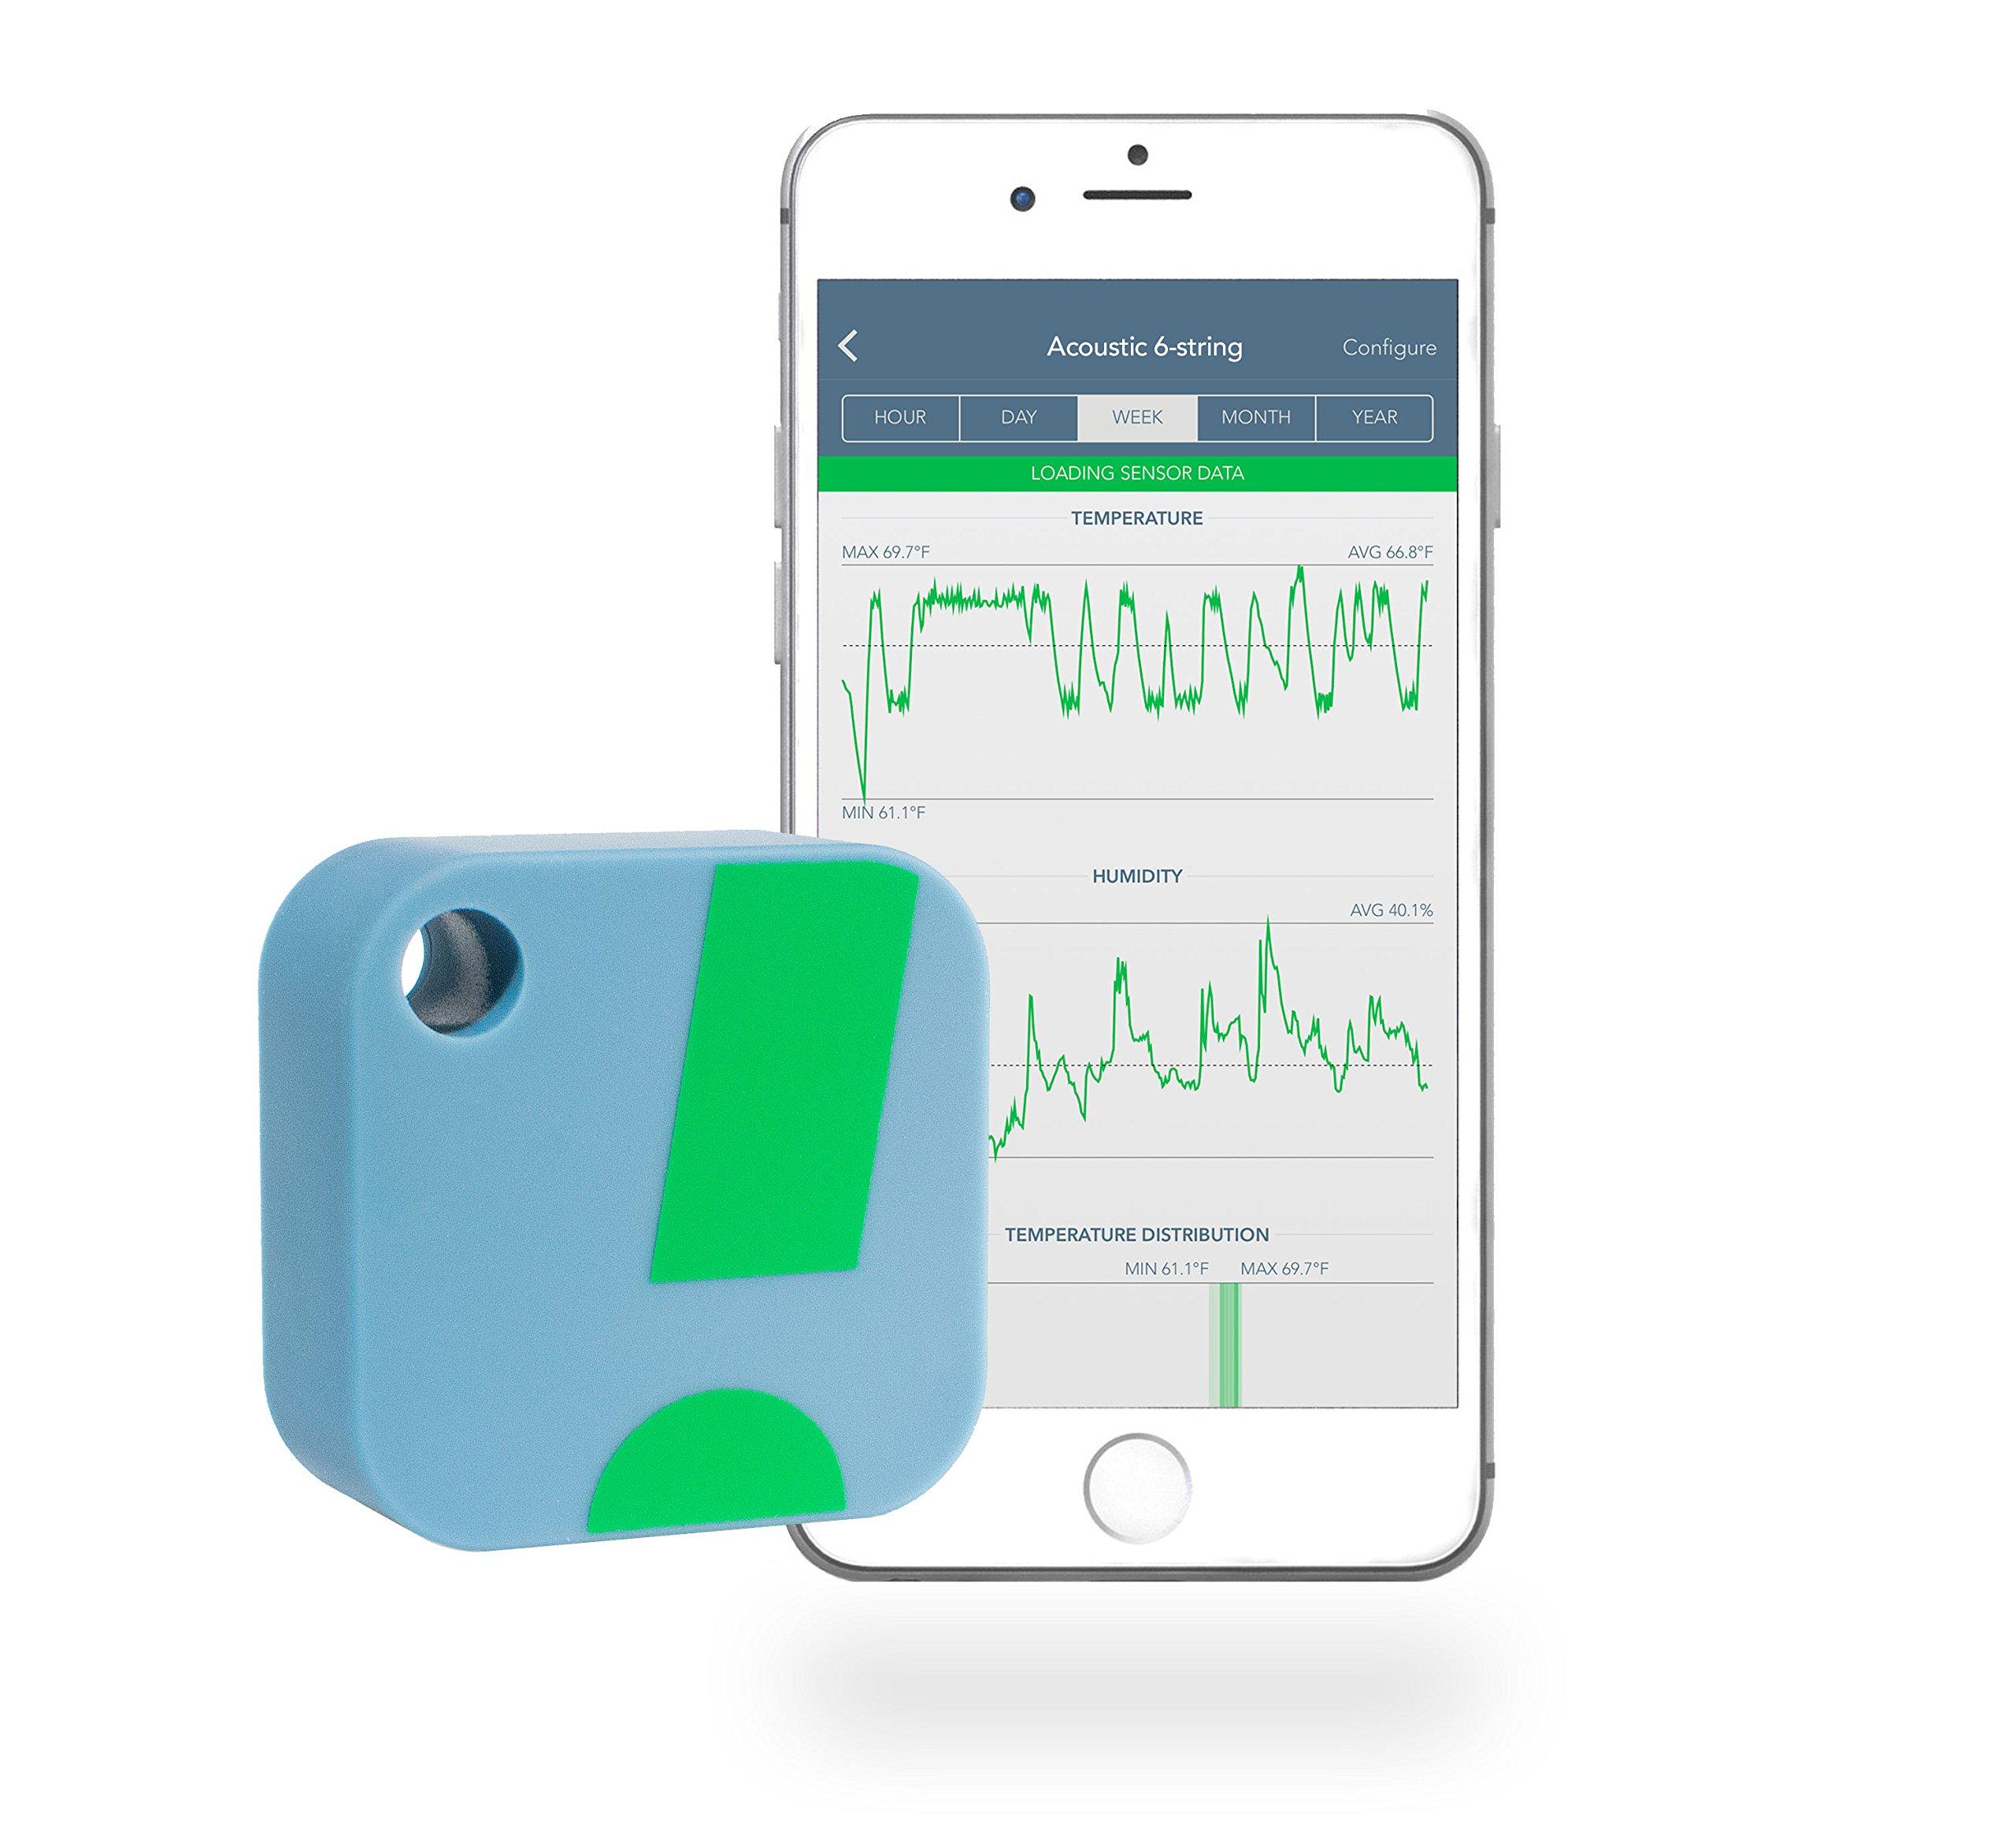 SensorPush Wireless Thermometer Hygrometer Android